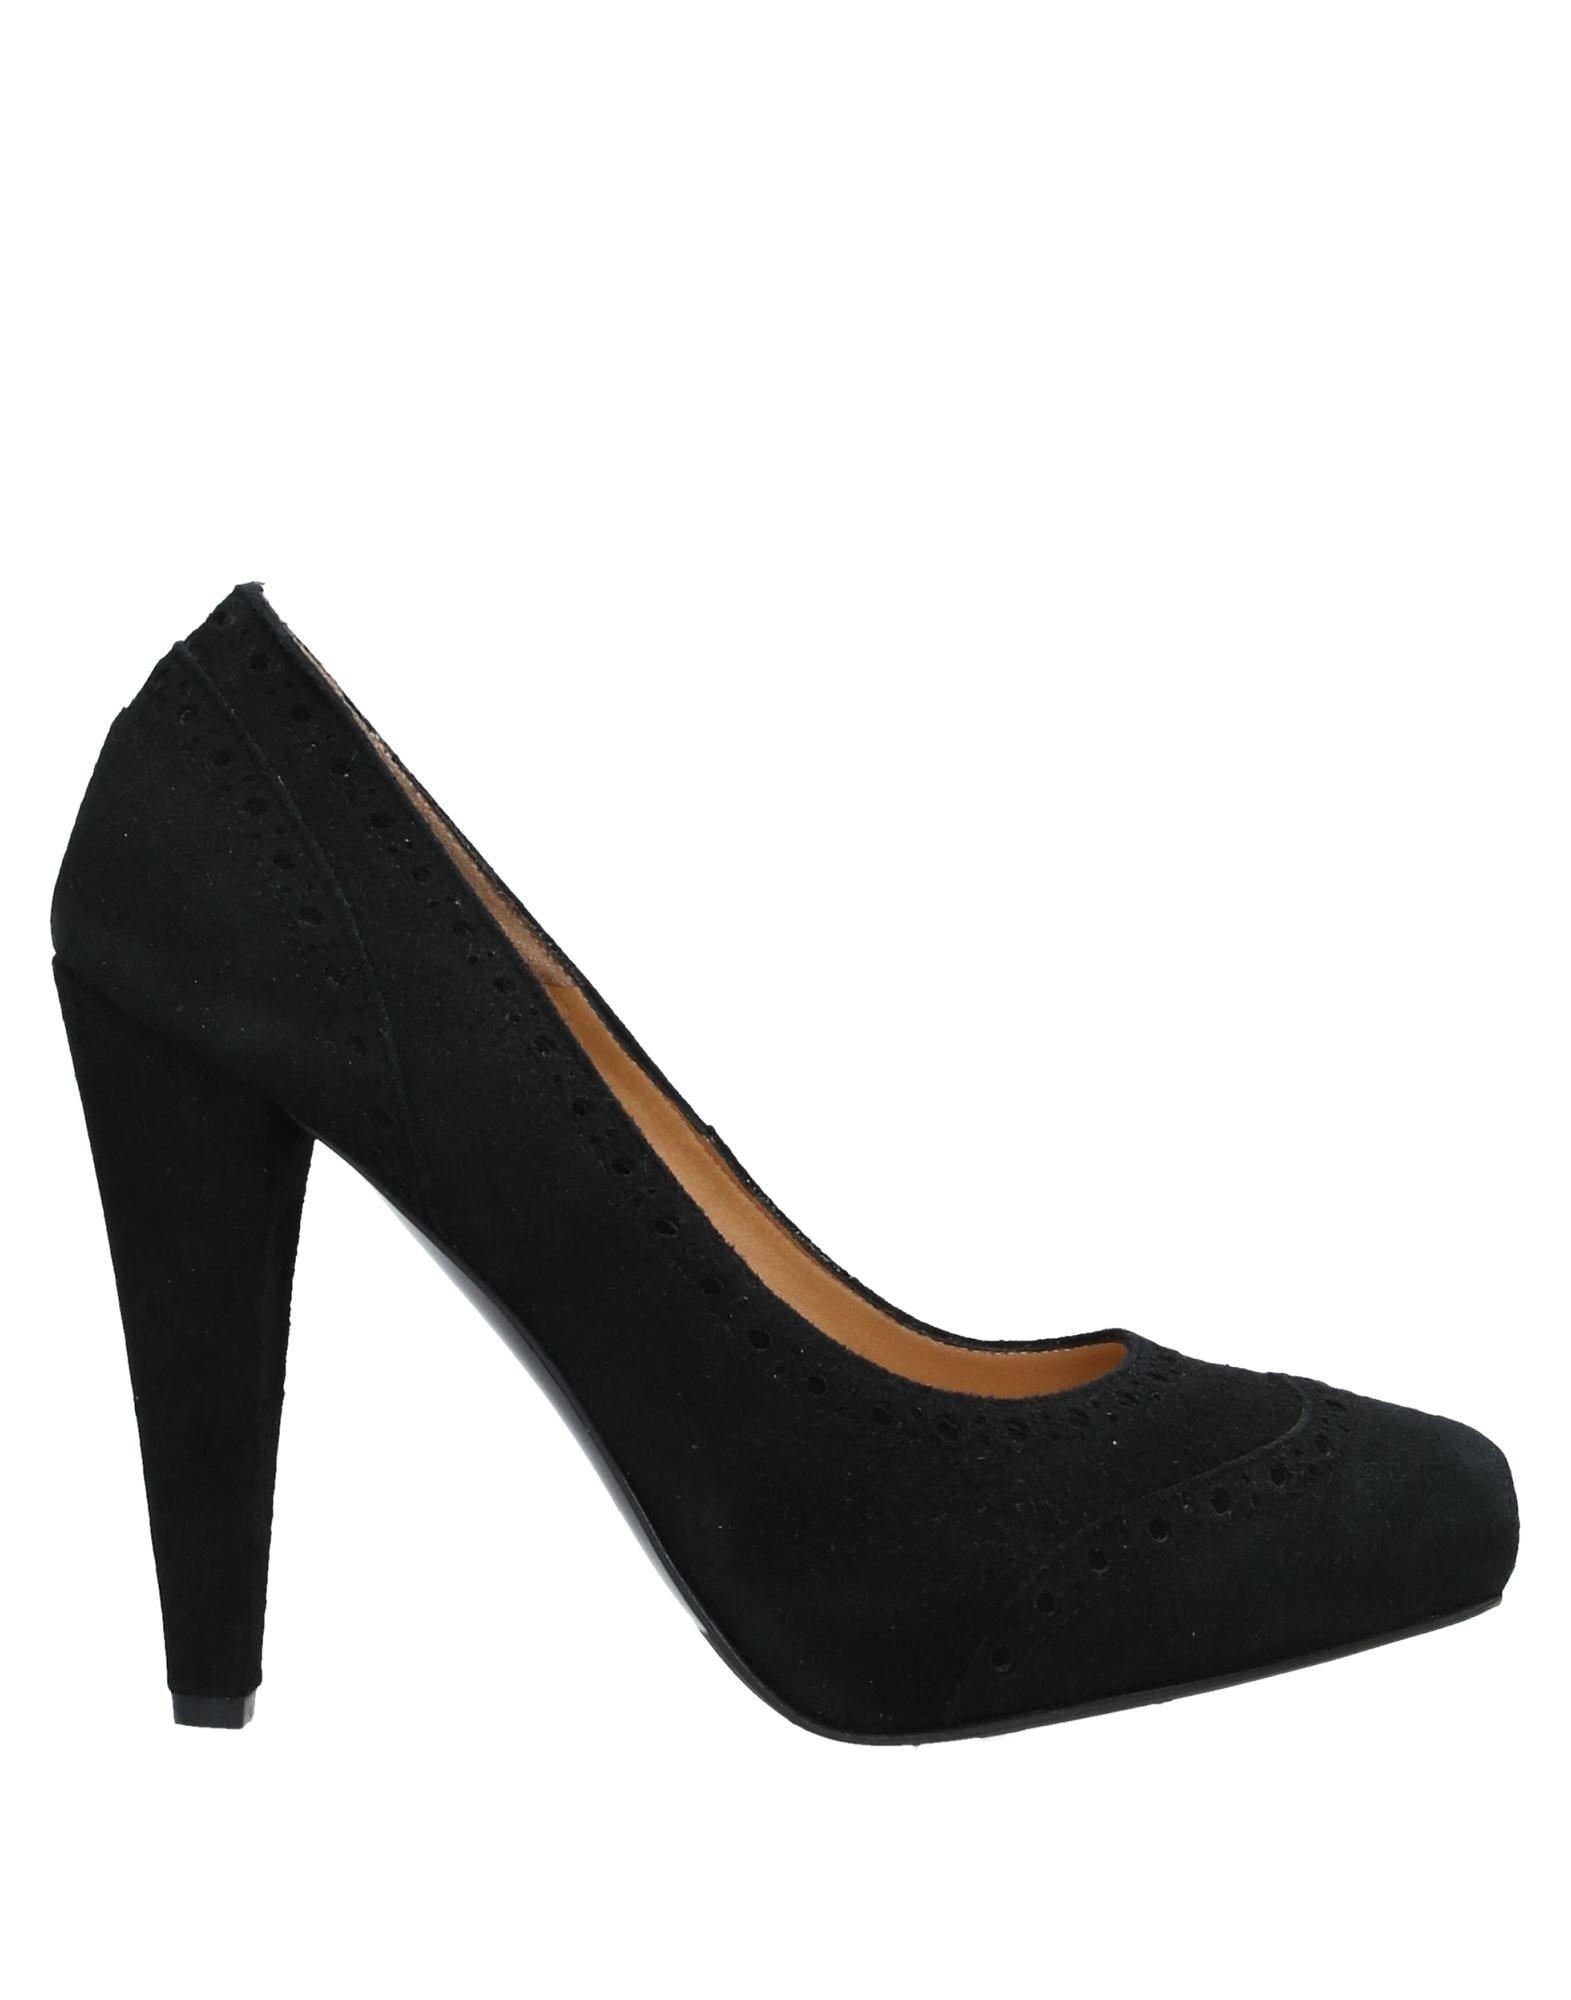 DEIMILLE Аксессуар для обуви аксессуар